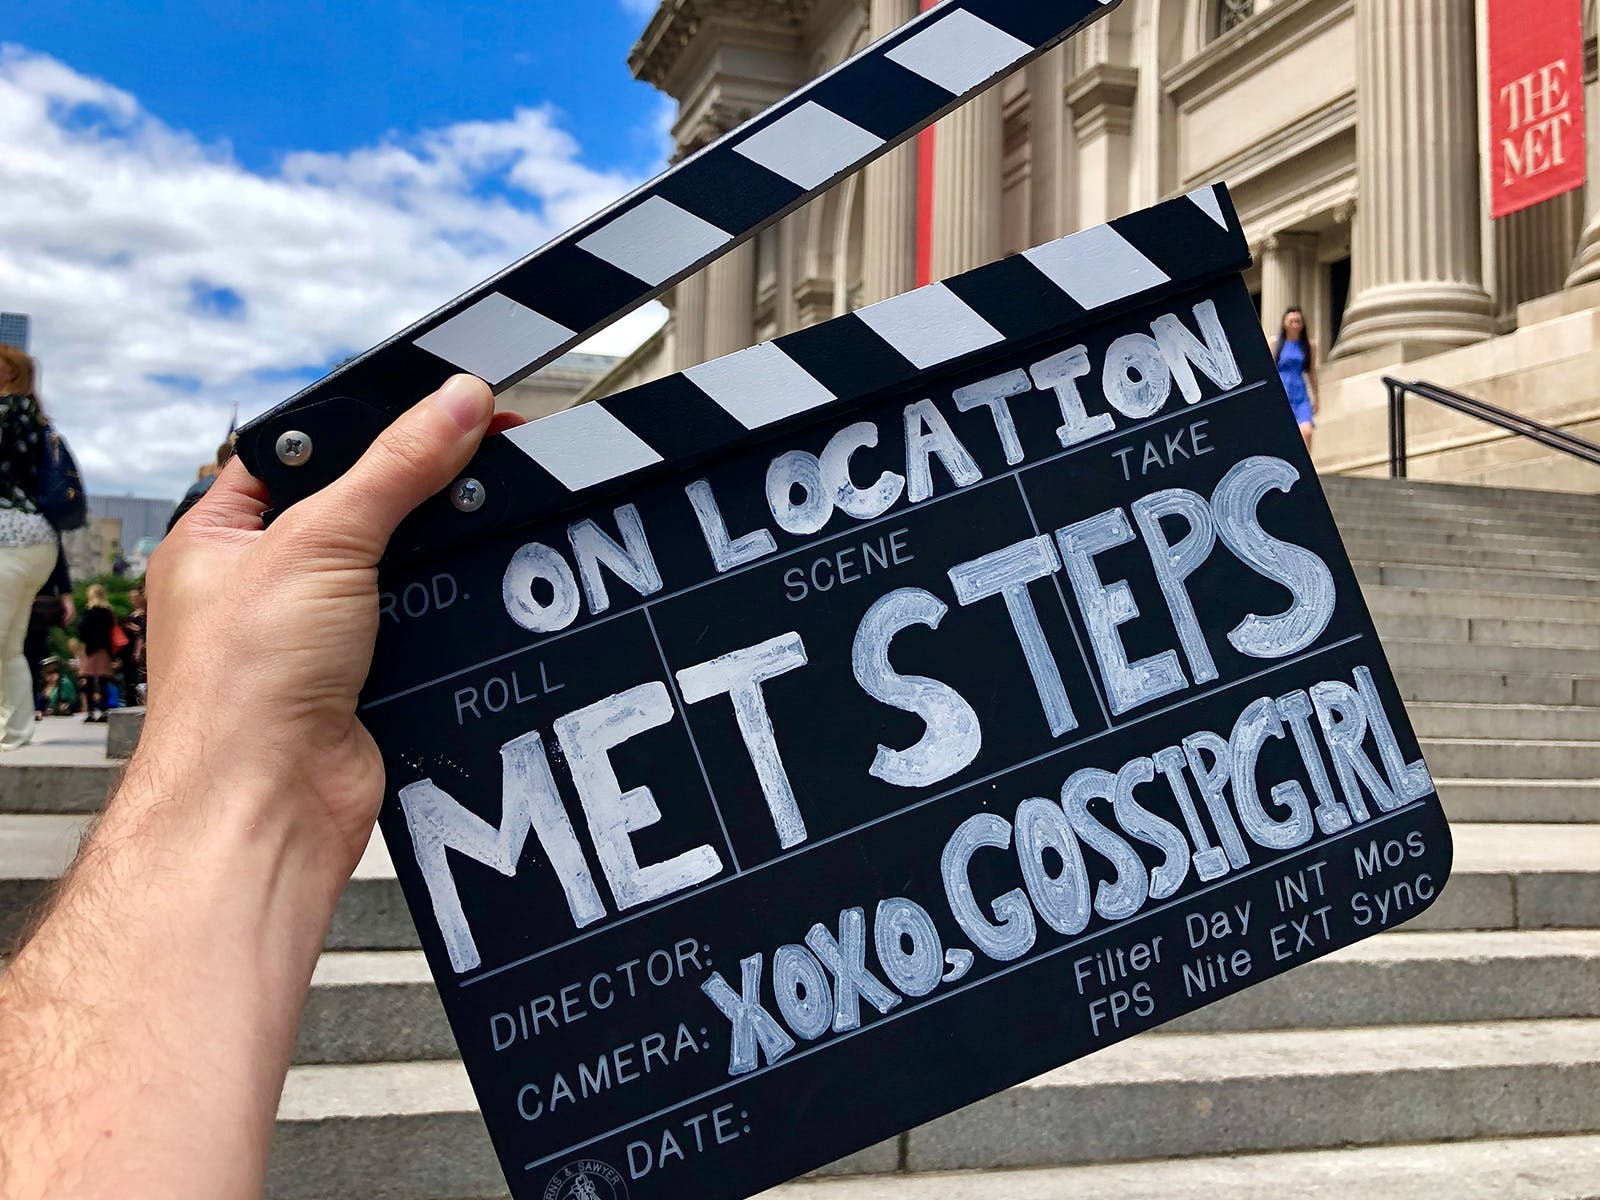 Gossip Girl Sites Tour Tickets | New York | TodayTix